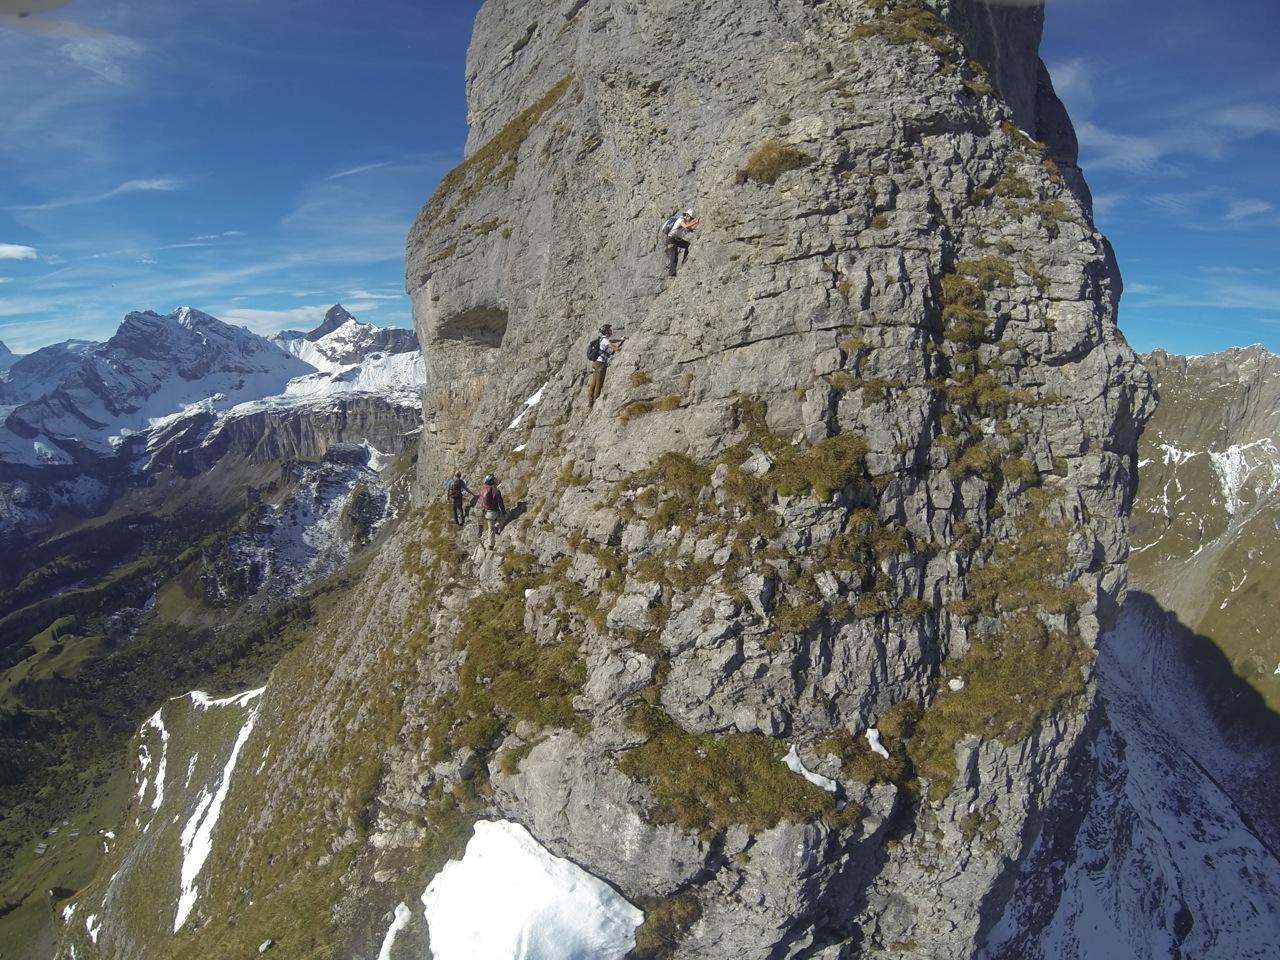 Klettersteig Braunwald : Klettersteig braunwald fpv blog